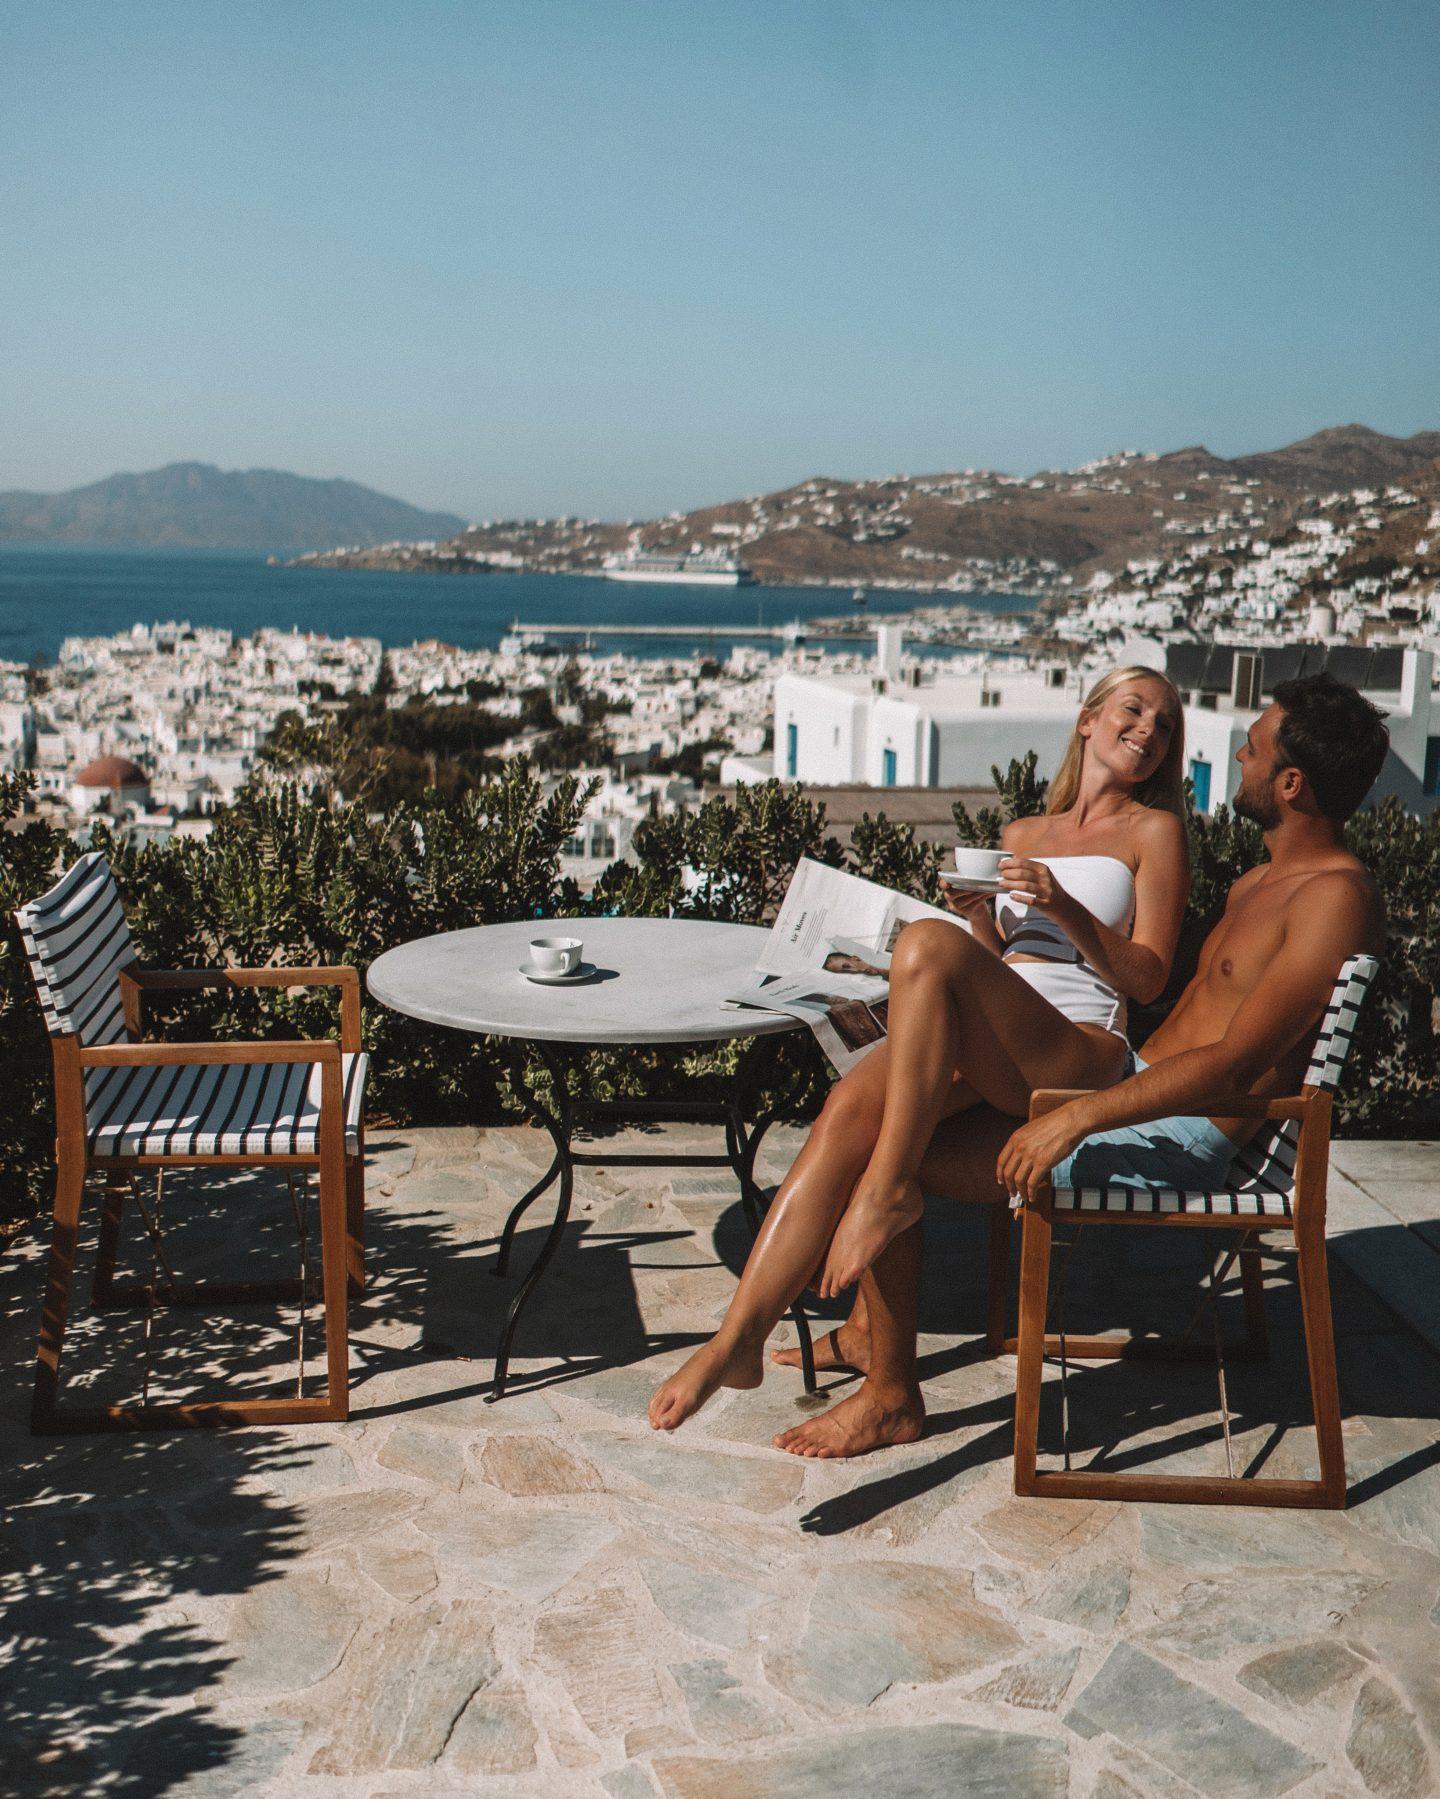 Belvedere hotel mykonos, view on the Aegan sea